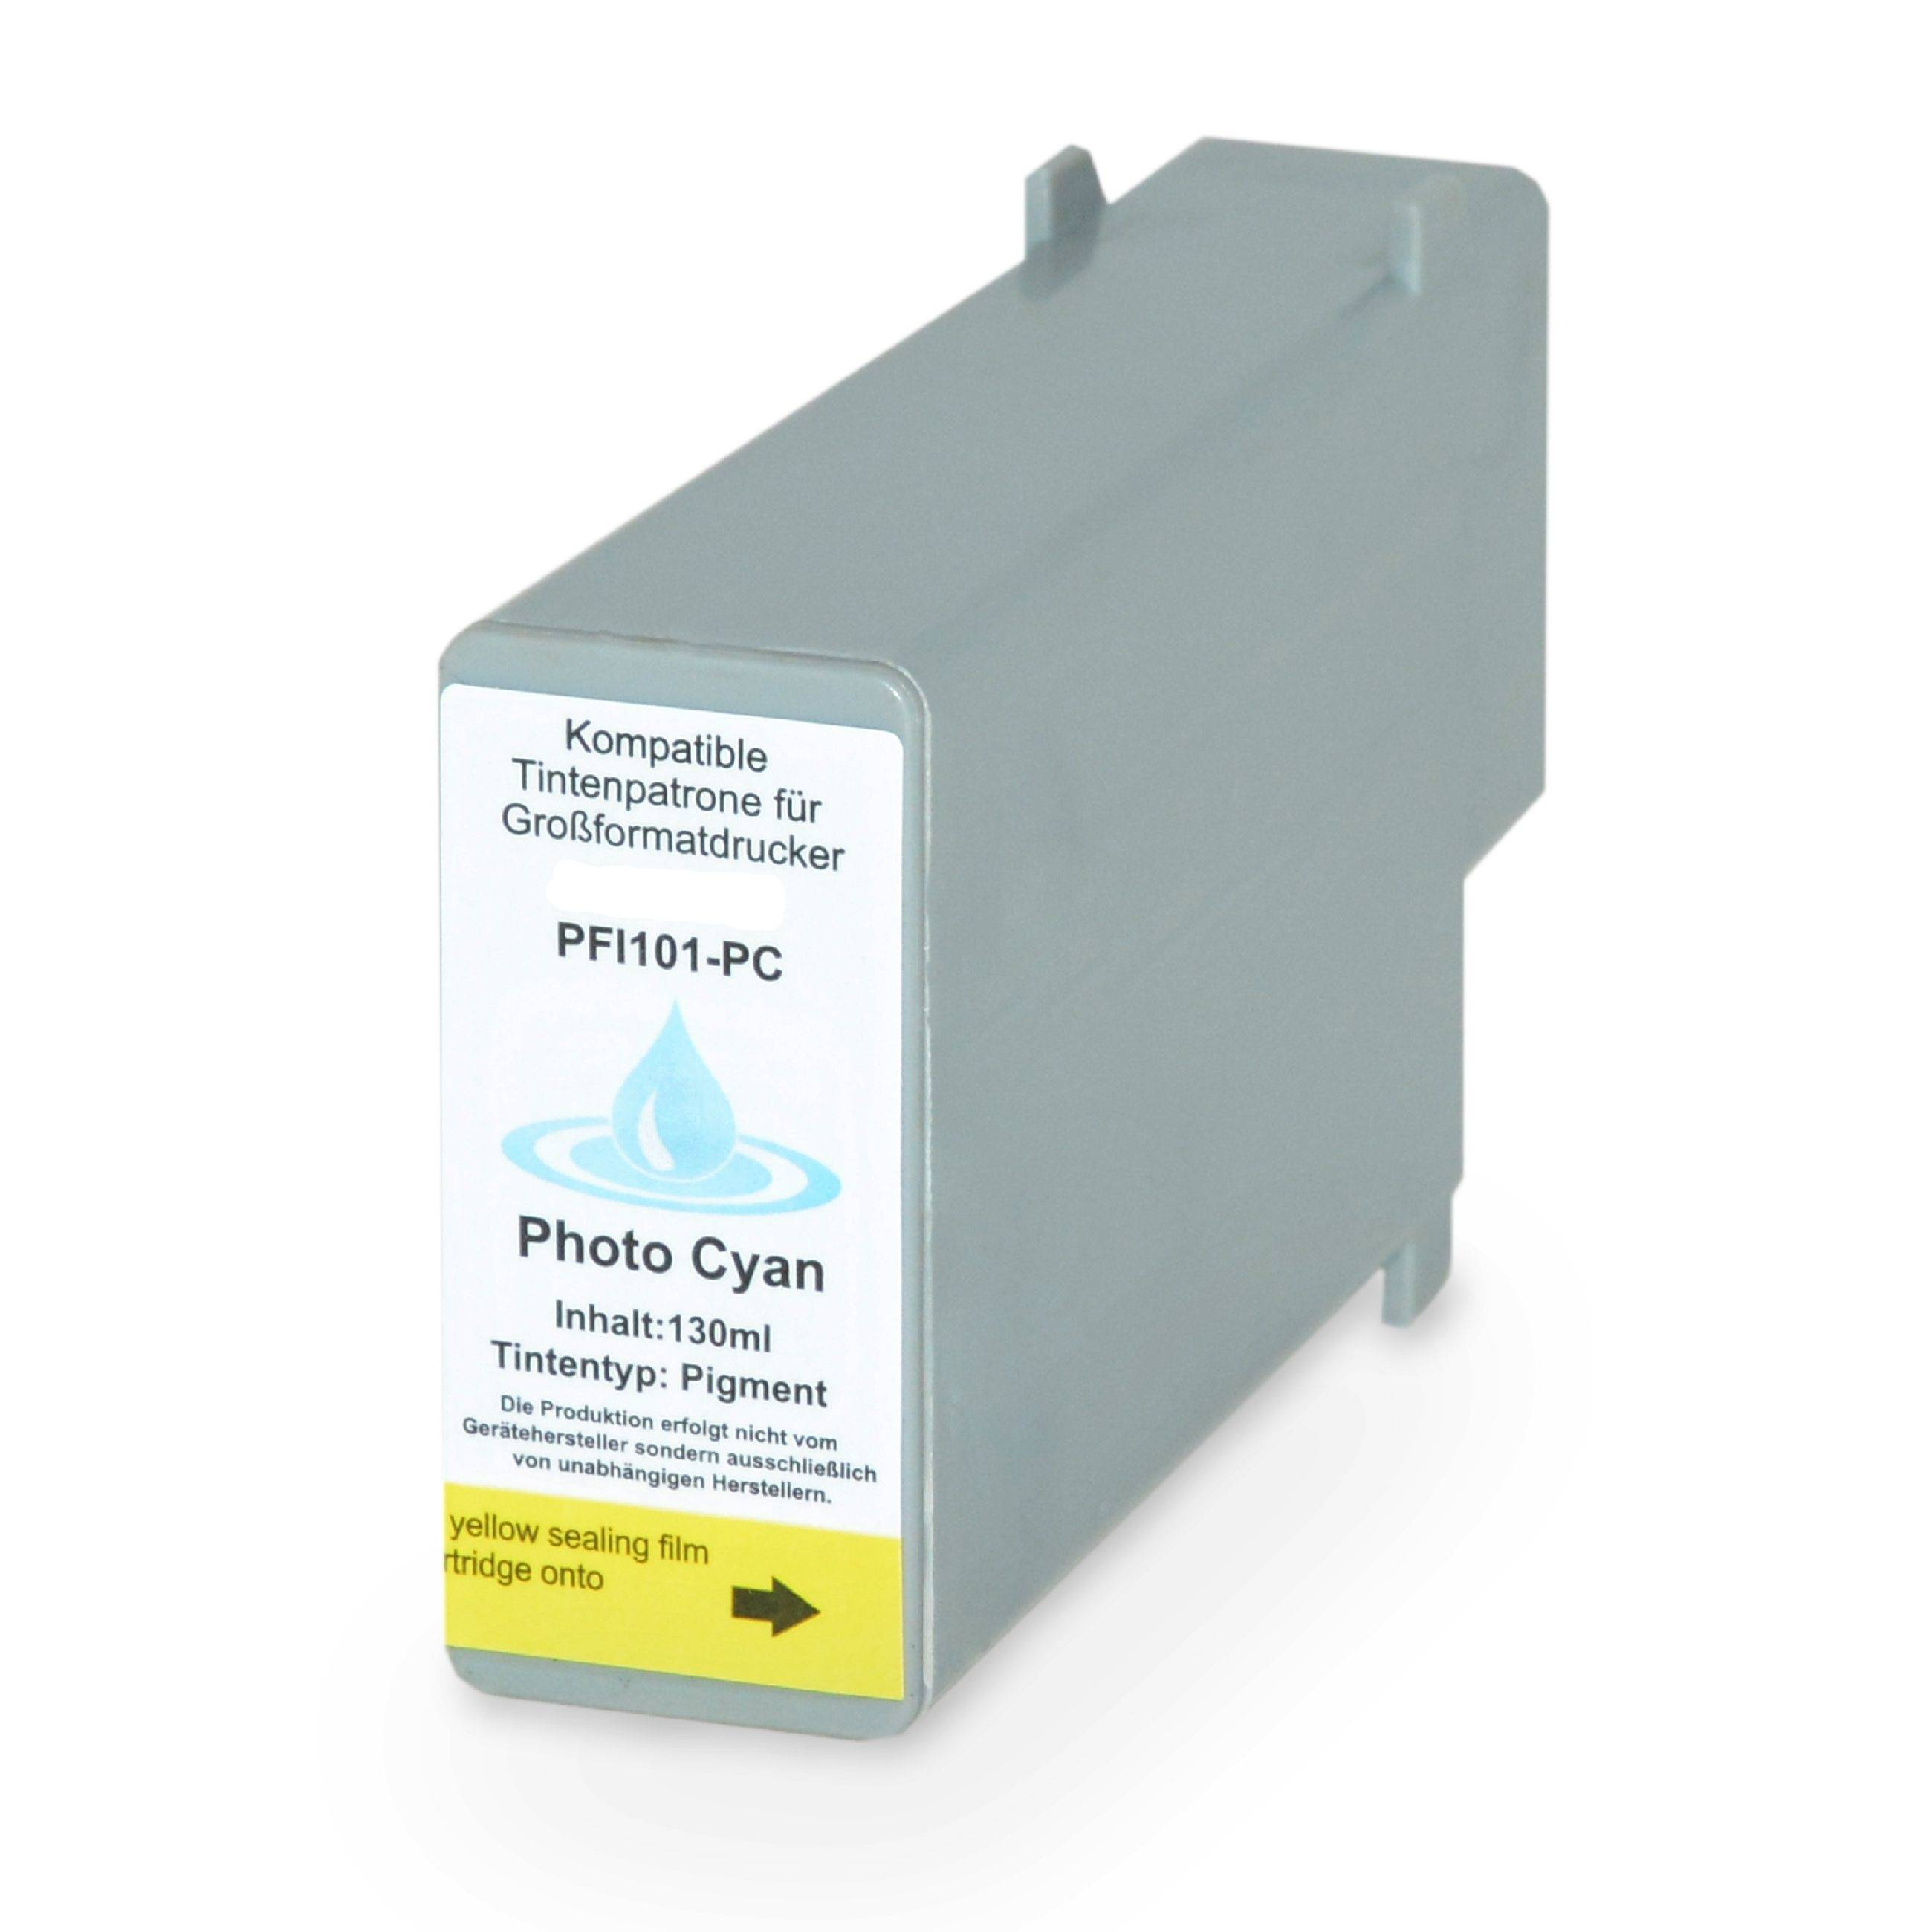 Canon Cartouche d'encre pour Canon 0887B001 / PFI-101 PC cyan-photo compatible (de marque ASC)